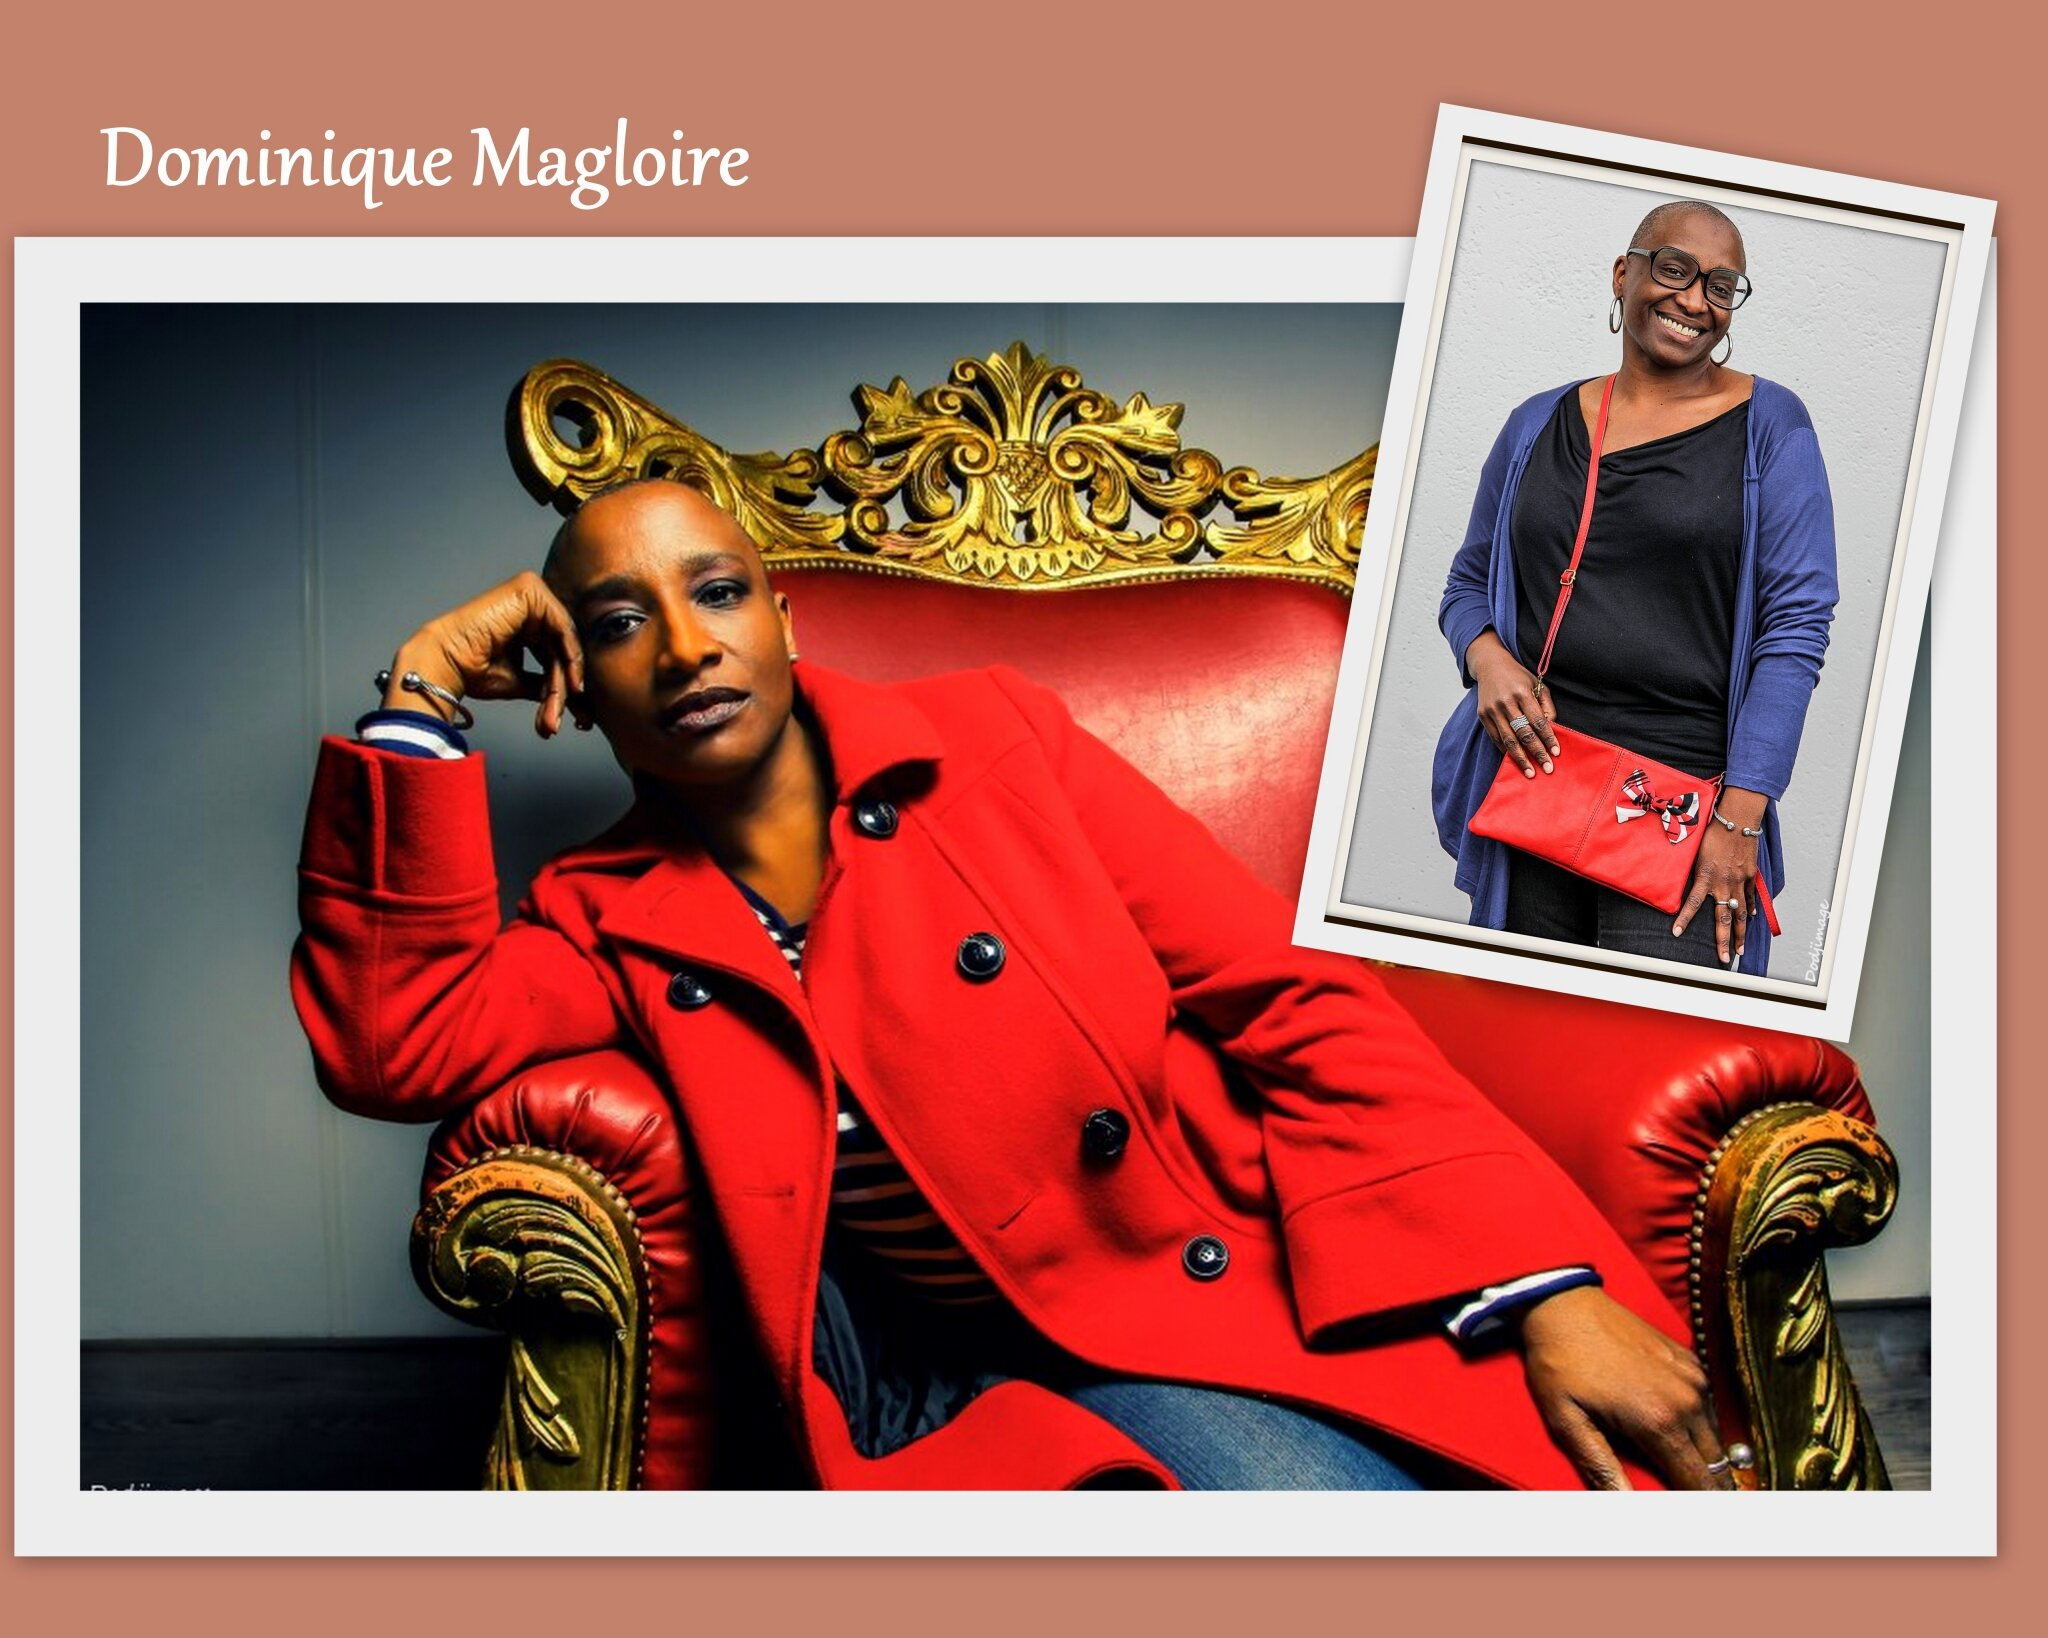 Dominique Magloire aime